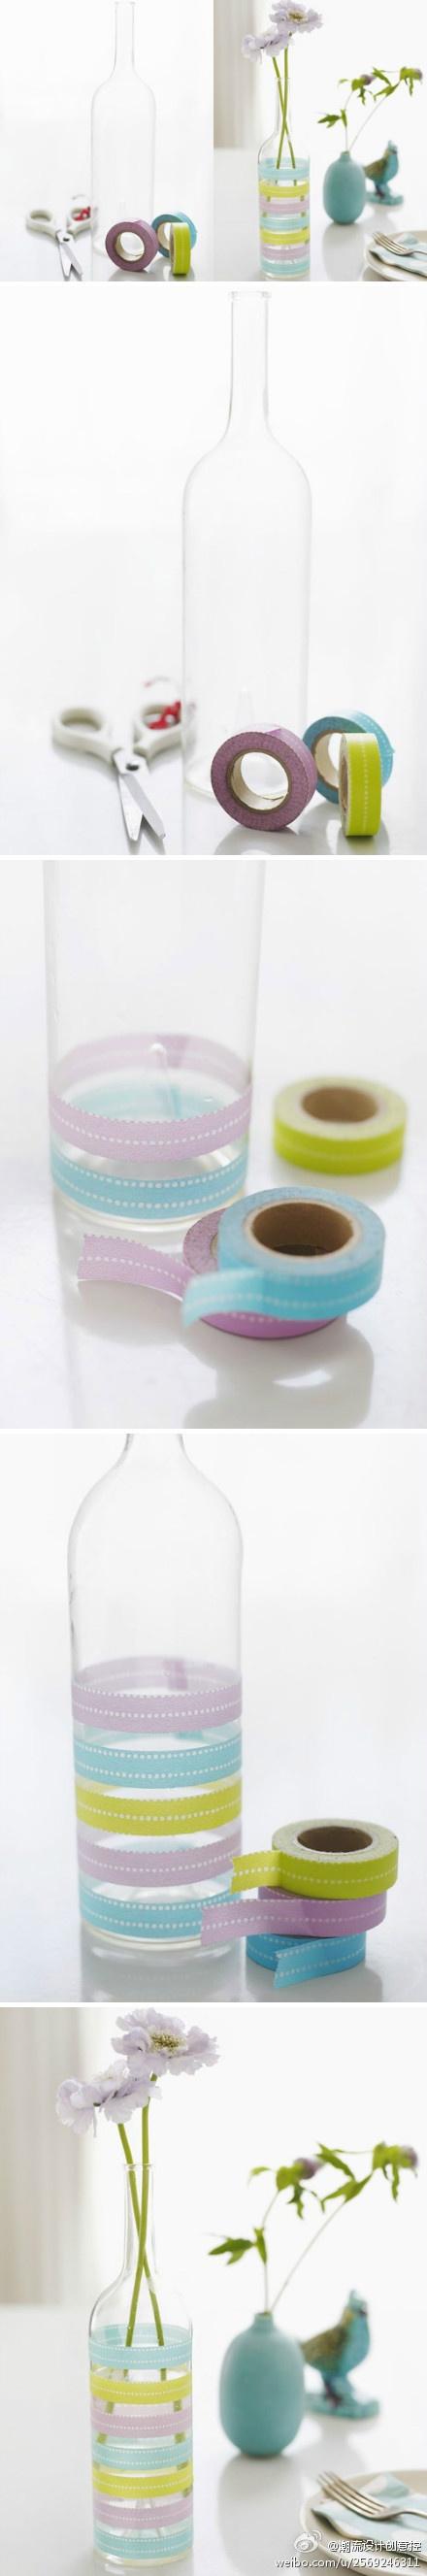 Washi Tape Vase! This looks so cool! Easy and cute ordinary vase transformation! #washitapevase #cutevaseidea #uniquevaseidea